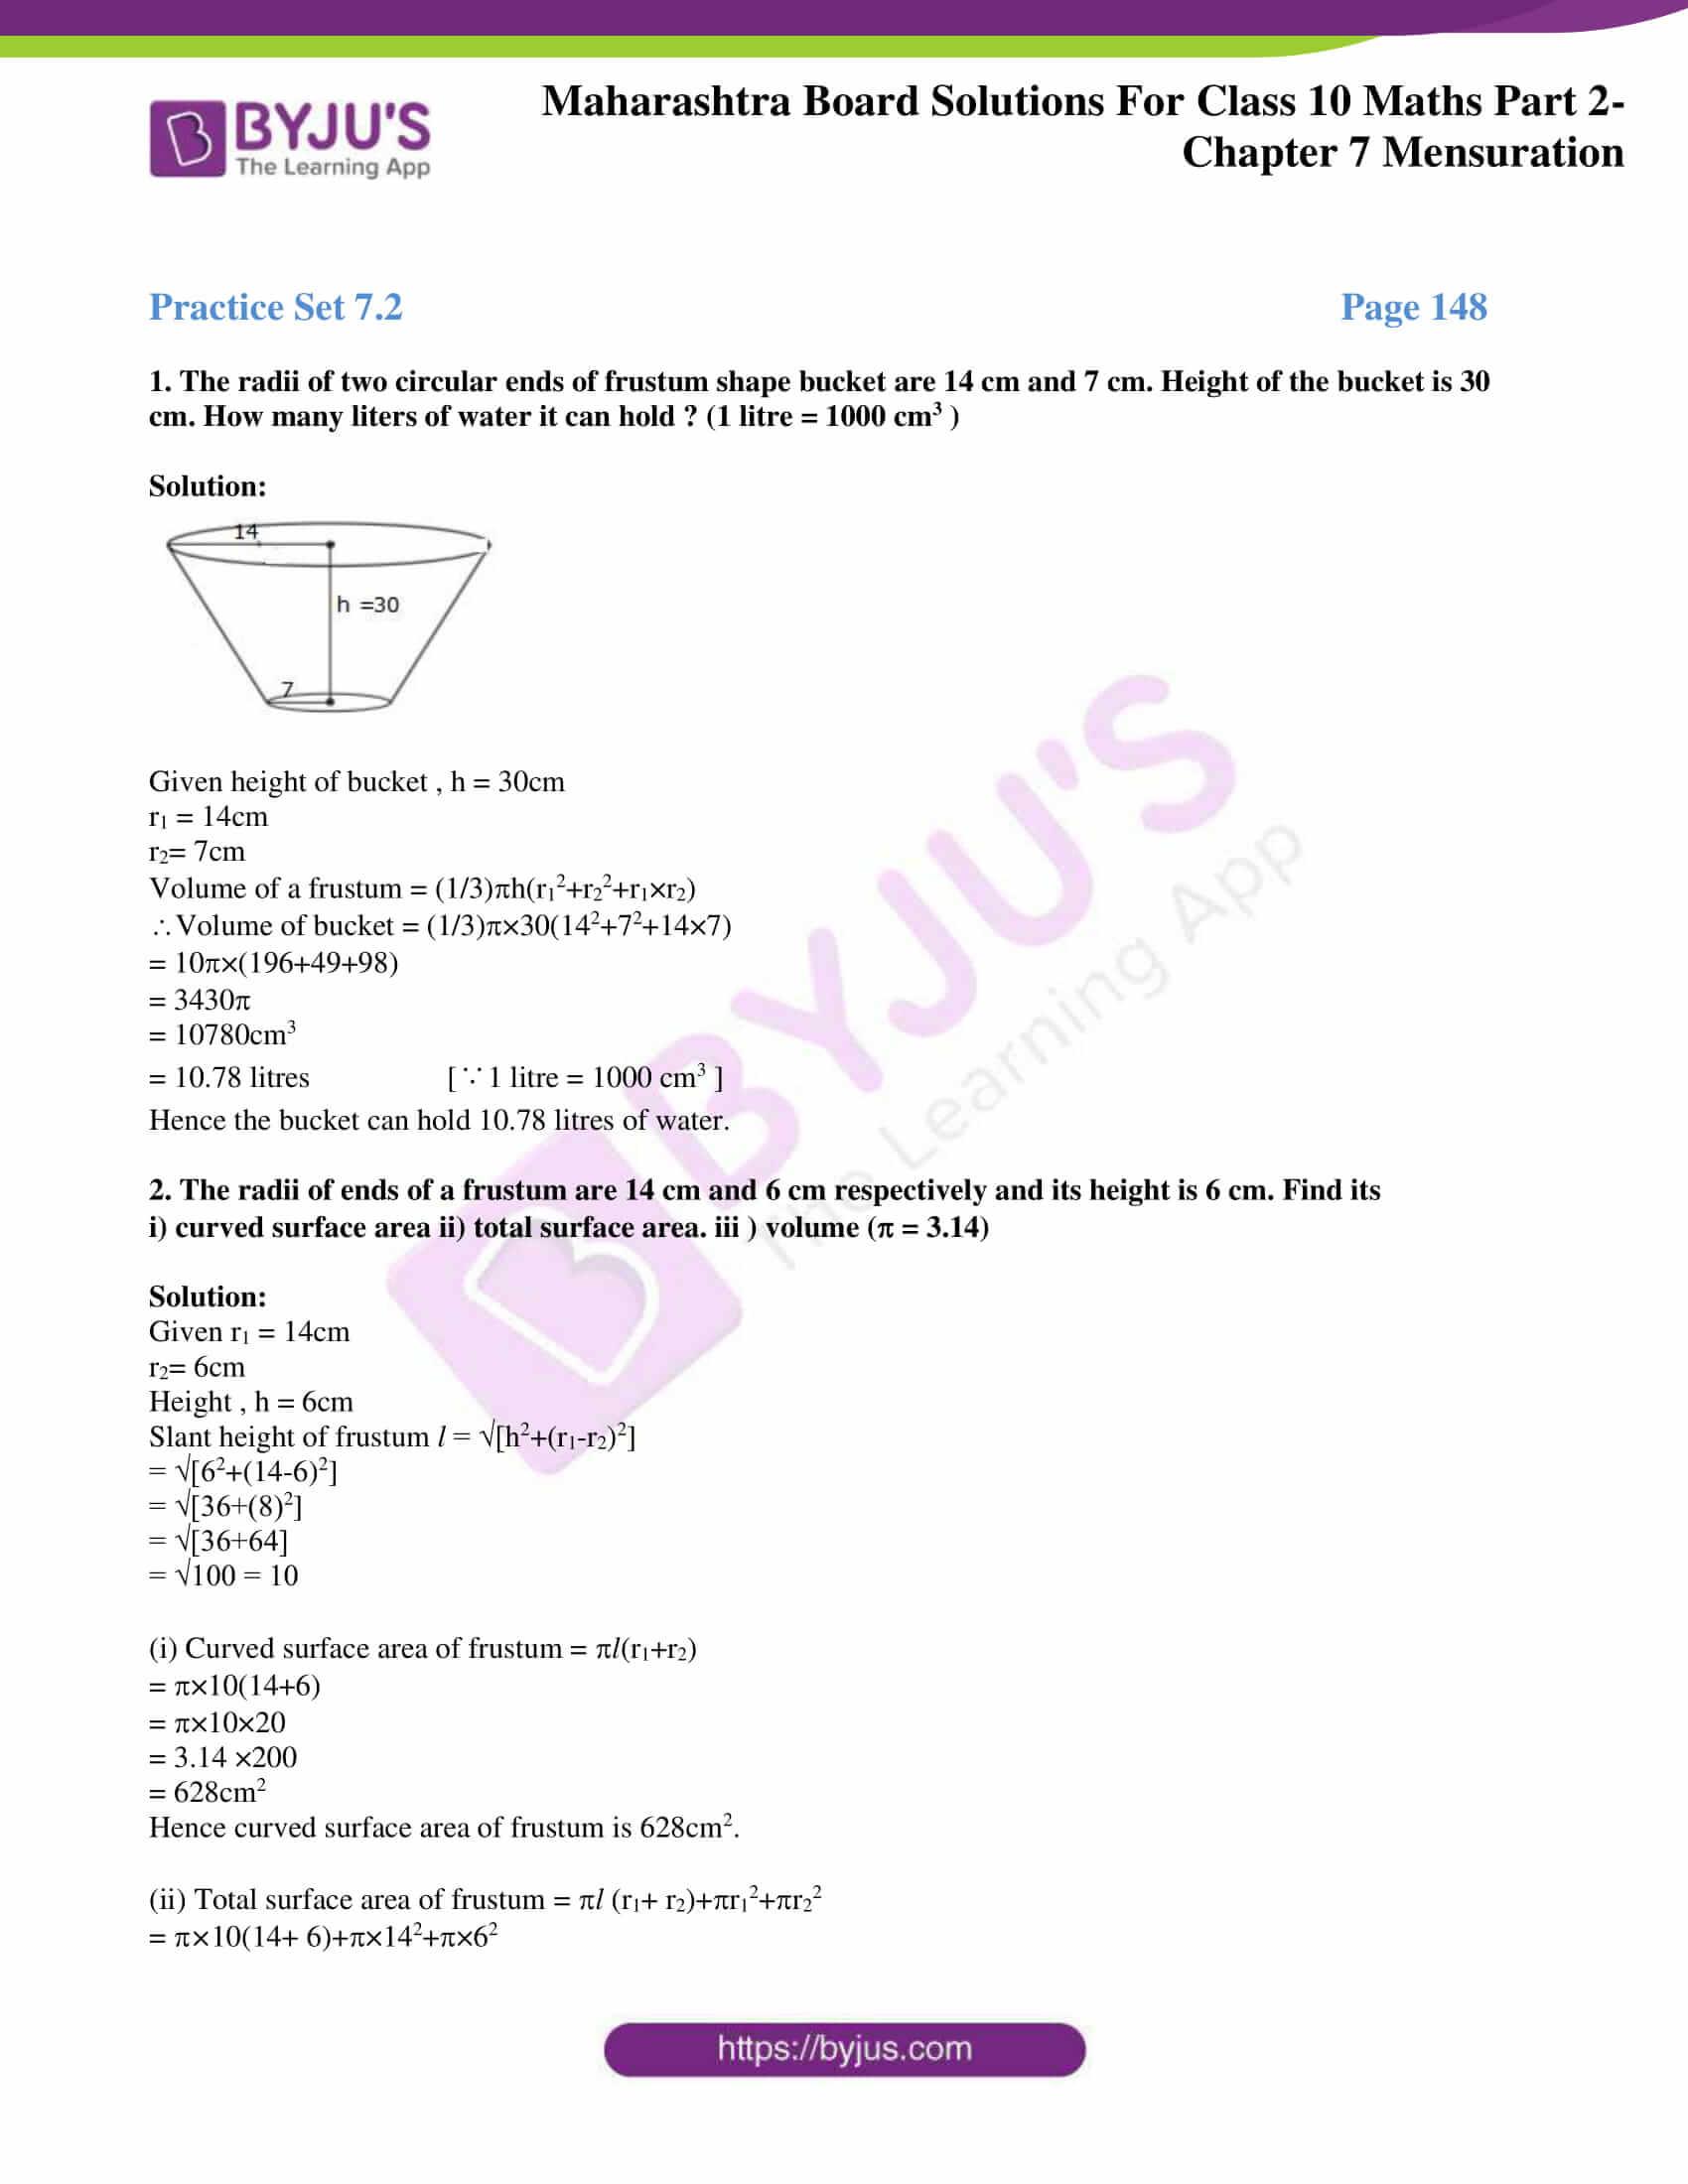 msbshse sol class 10 maths part 2 chapter 7 08